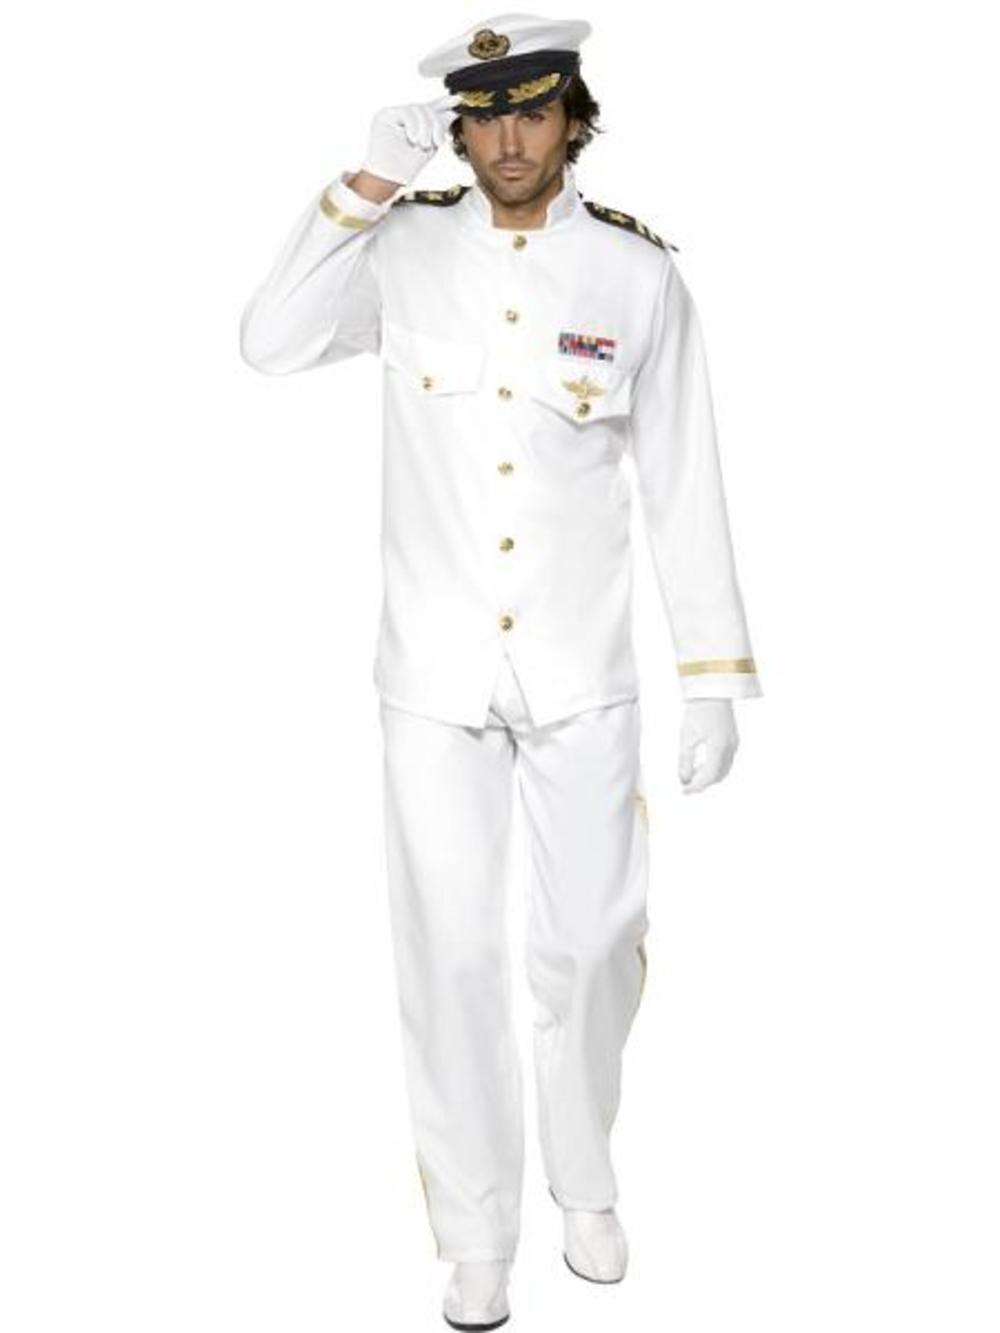 Deluxe White Captain Mens Fancy Dress Uniform Army Military Top Gun 80s Costume